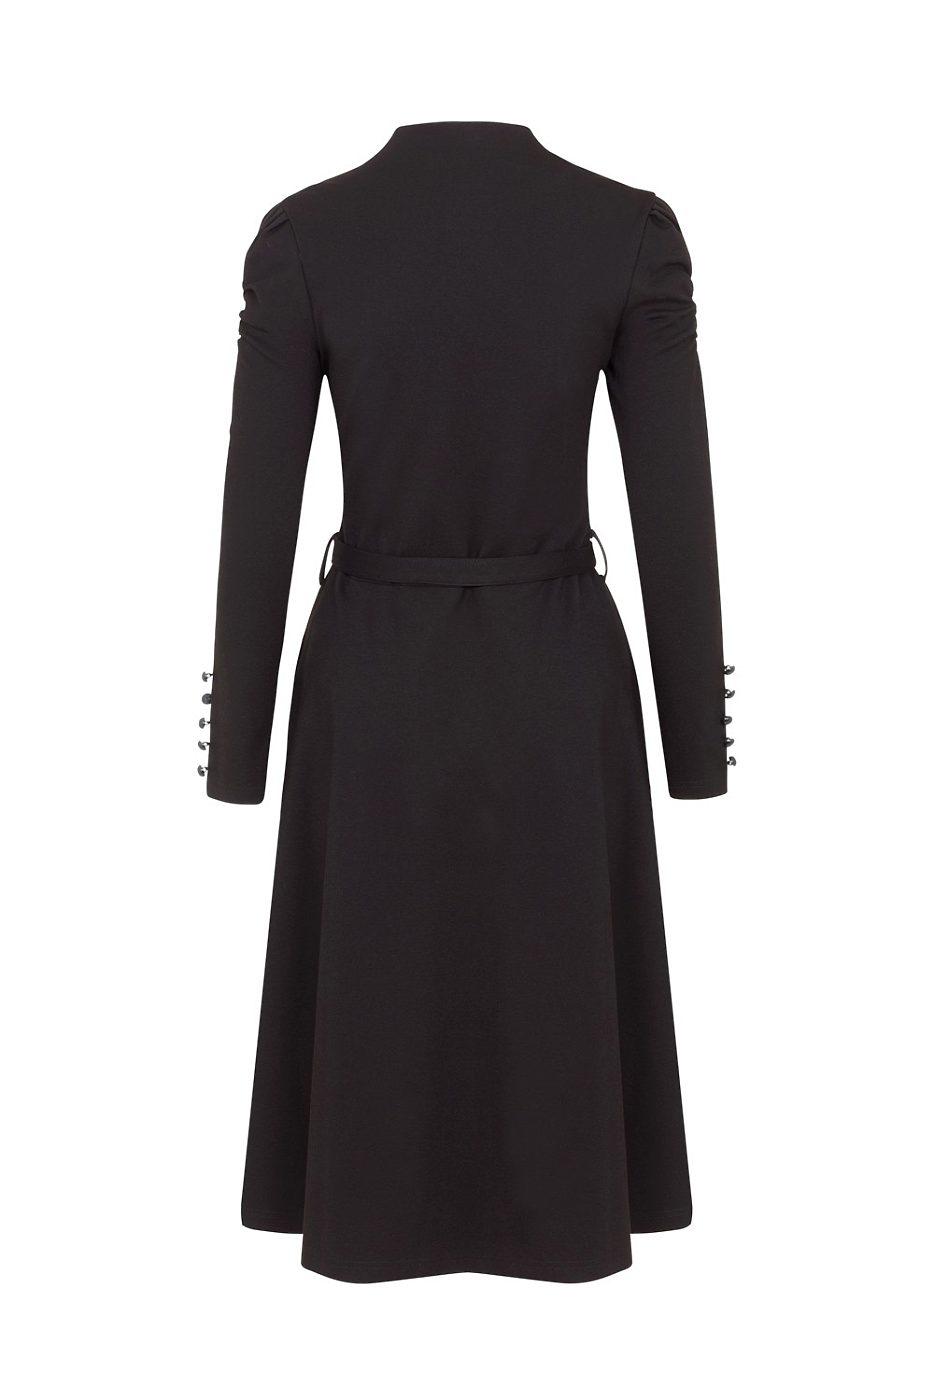 Černé šaty s dlouhým rukávem Voodoo Vixen Dita Voodoo Vixen  e508280f82b